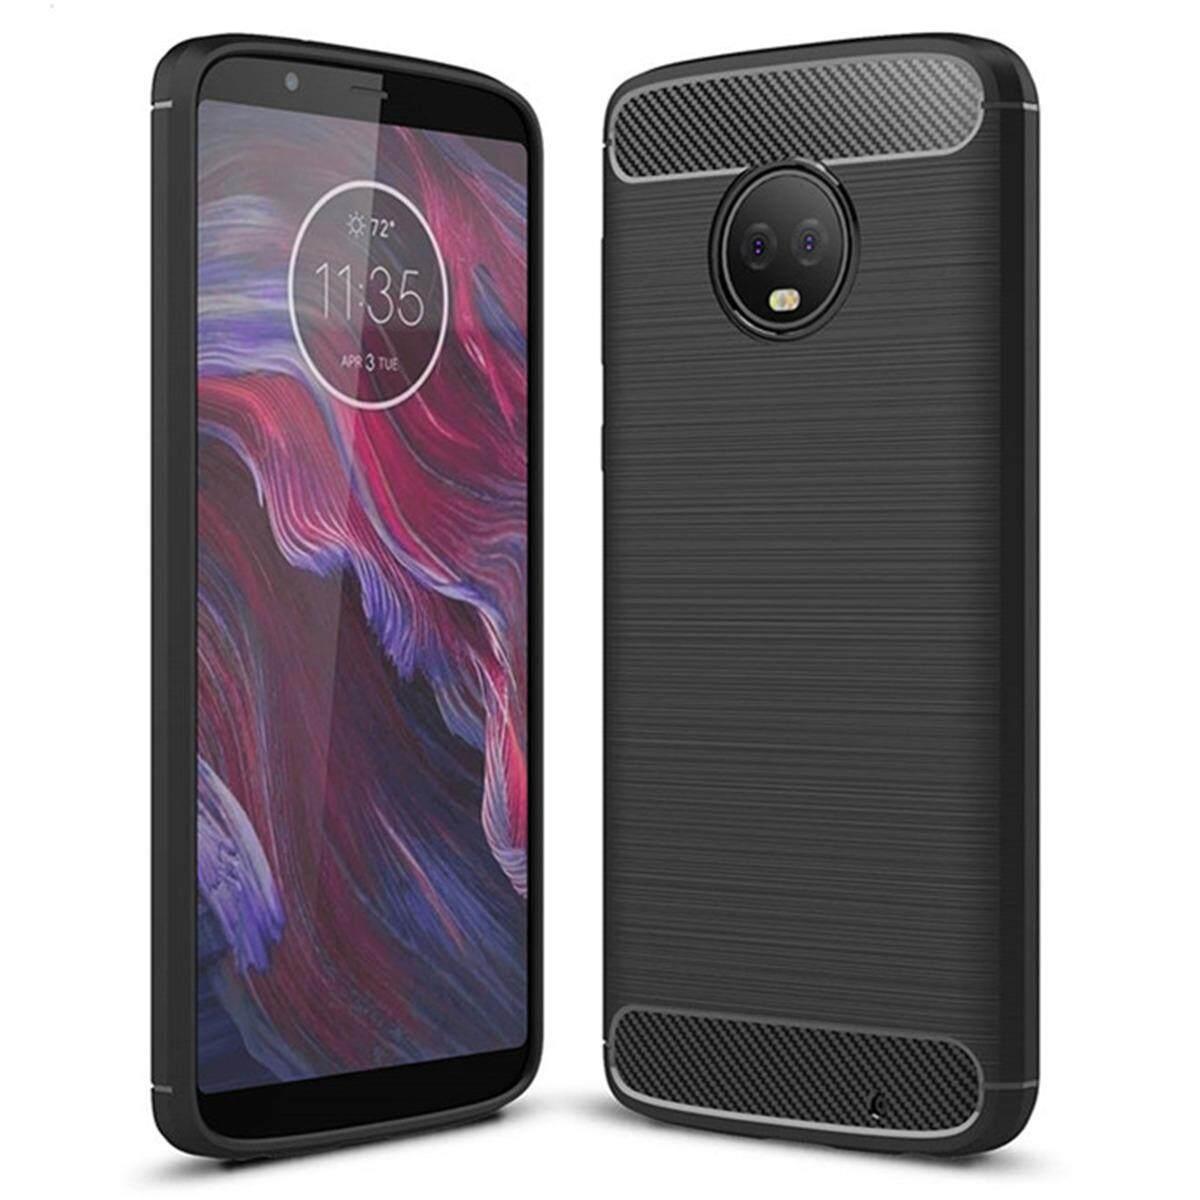 Hình ảnh for Motorola Moto G6 Plus Case Carbon Fibre Hairline Ultrathin Soft TPU Back Case Cover, Light, Minimalist, Non-slip, Shockproof, Anti-scratch